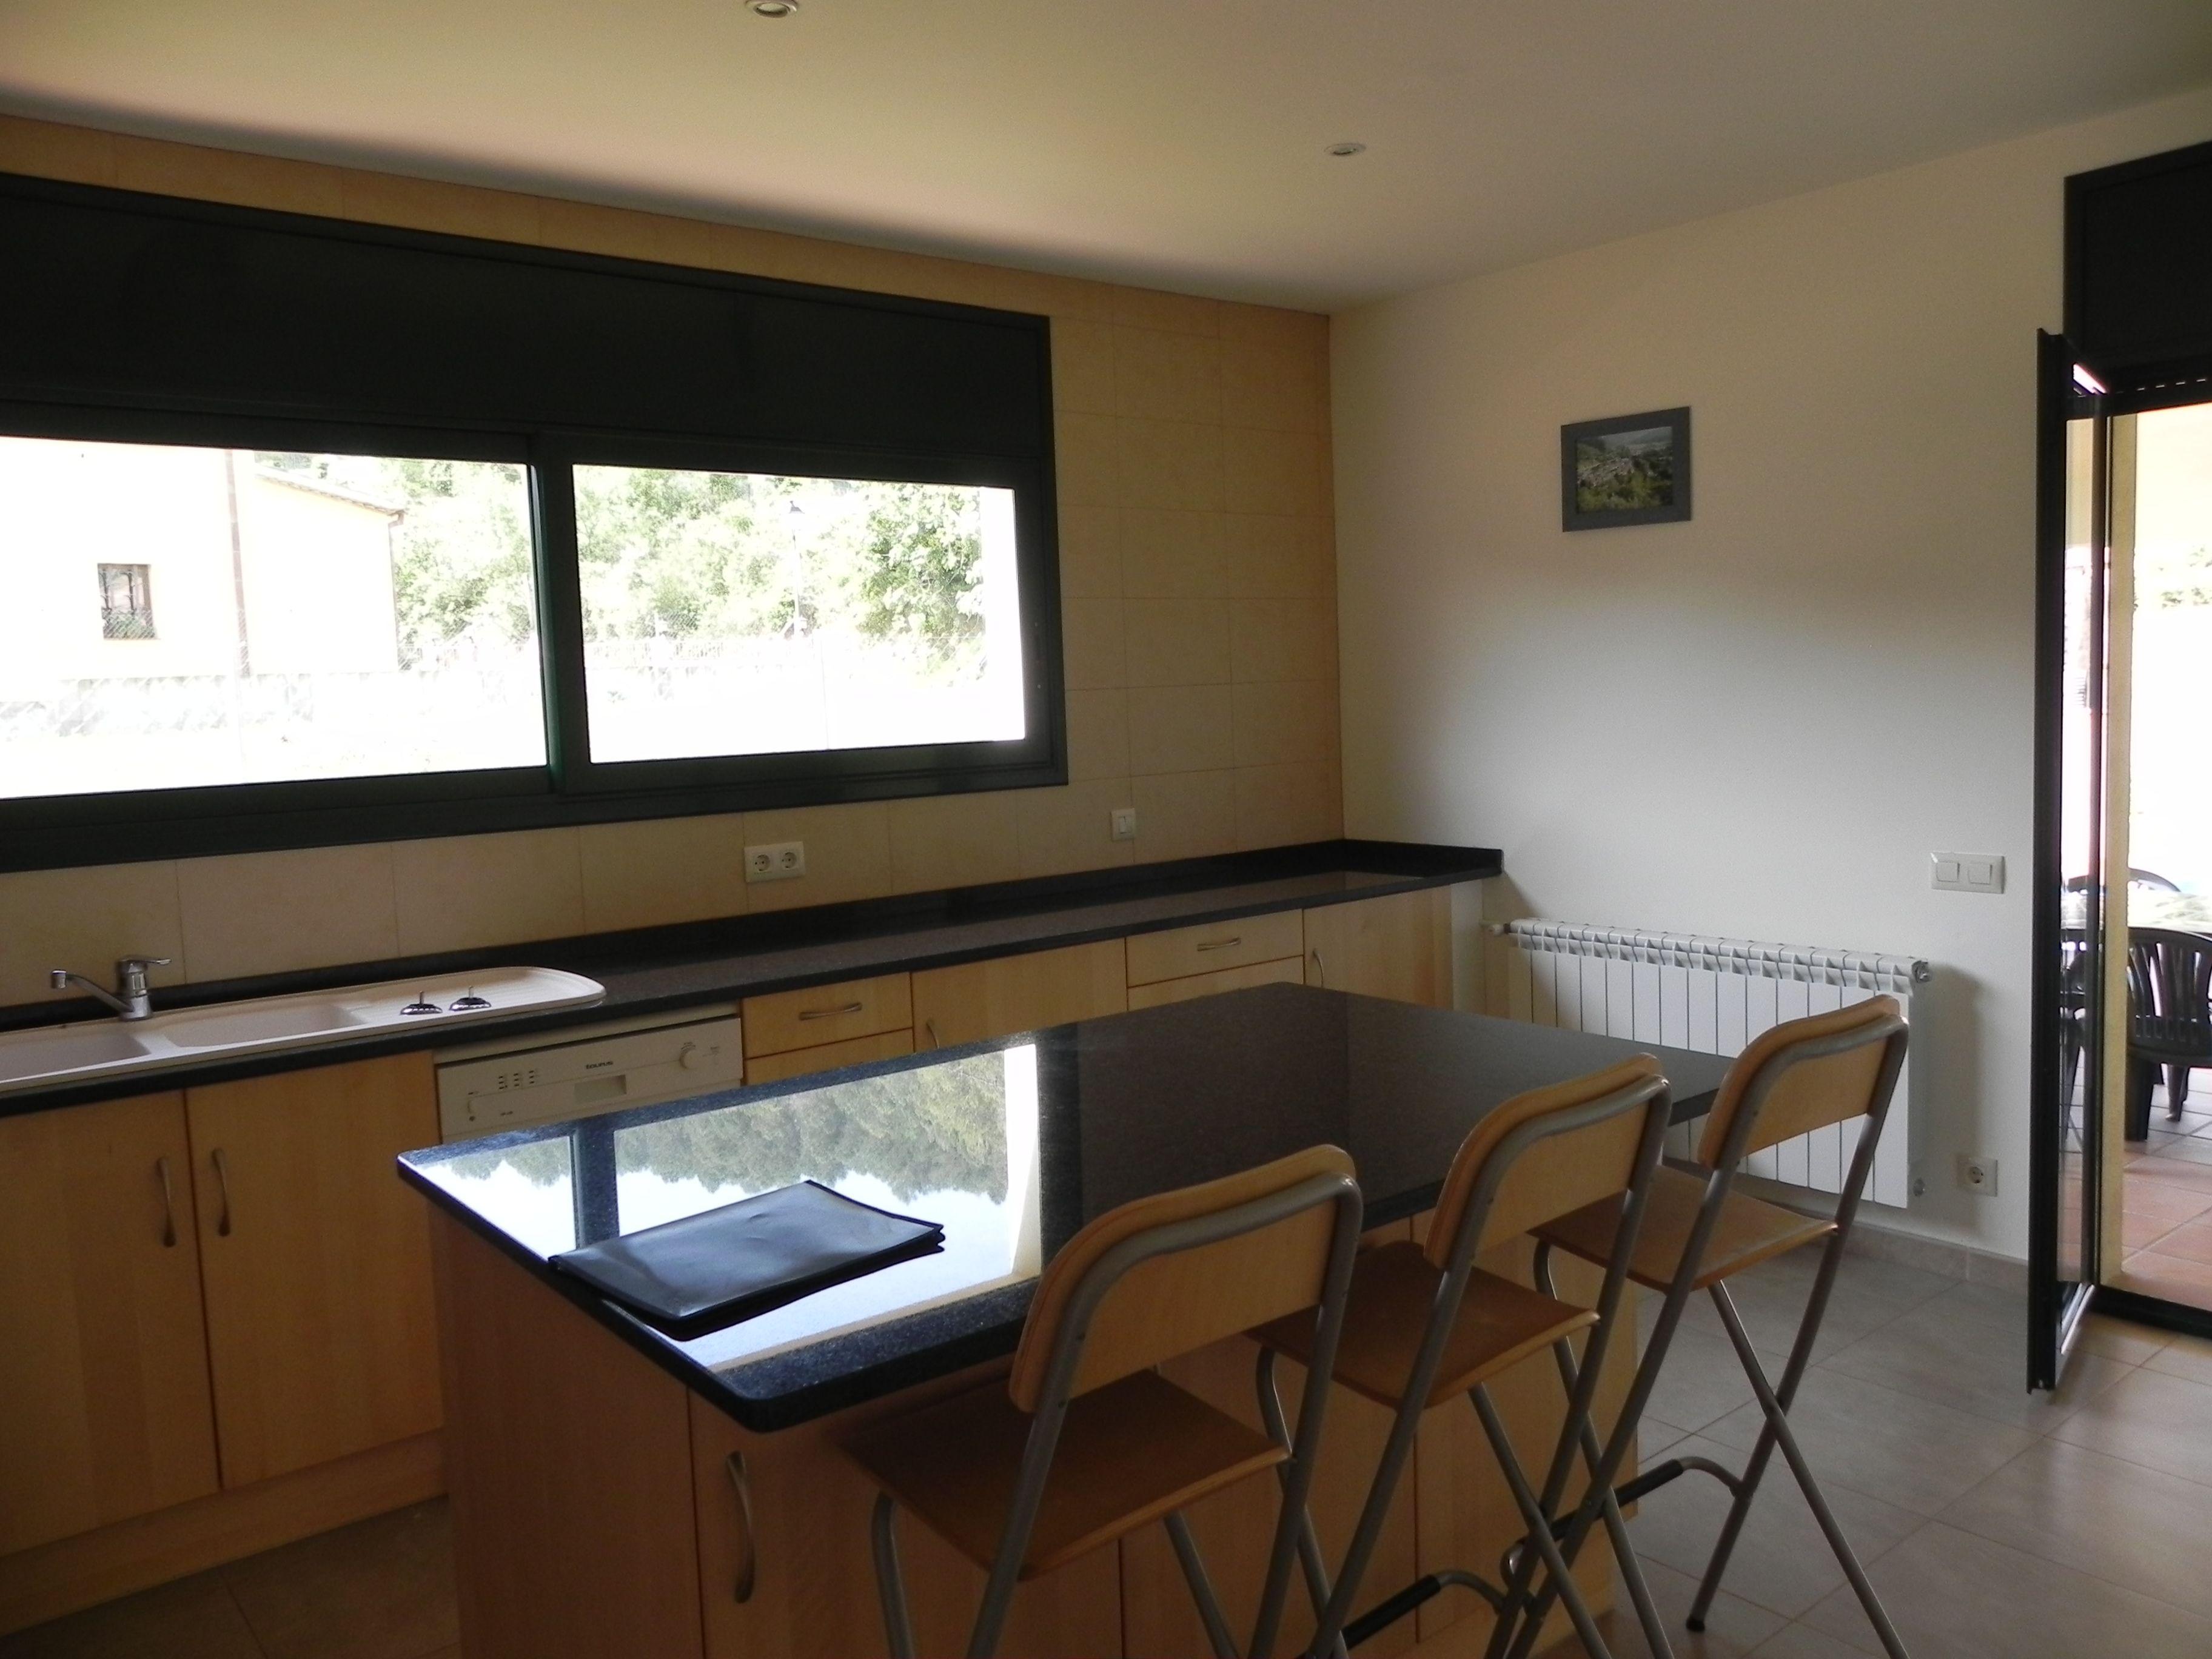 cuina kitchen